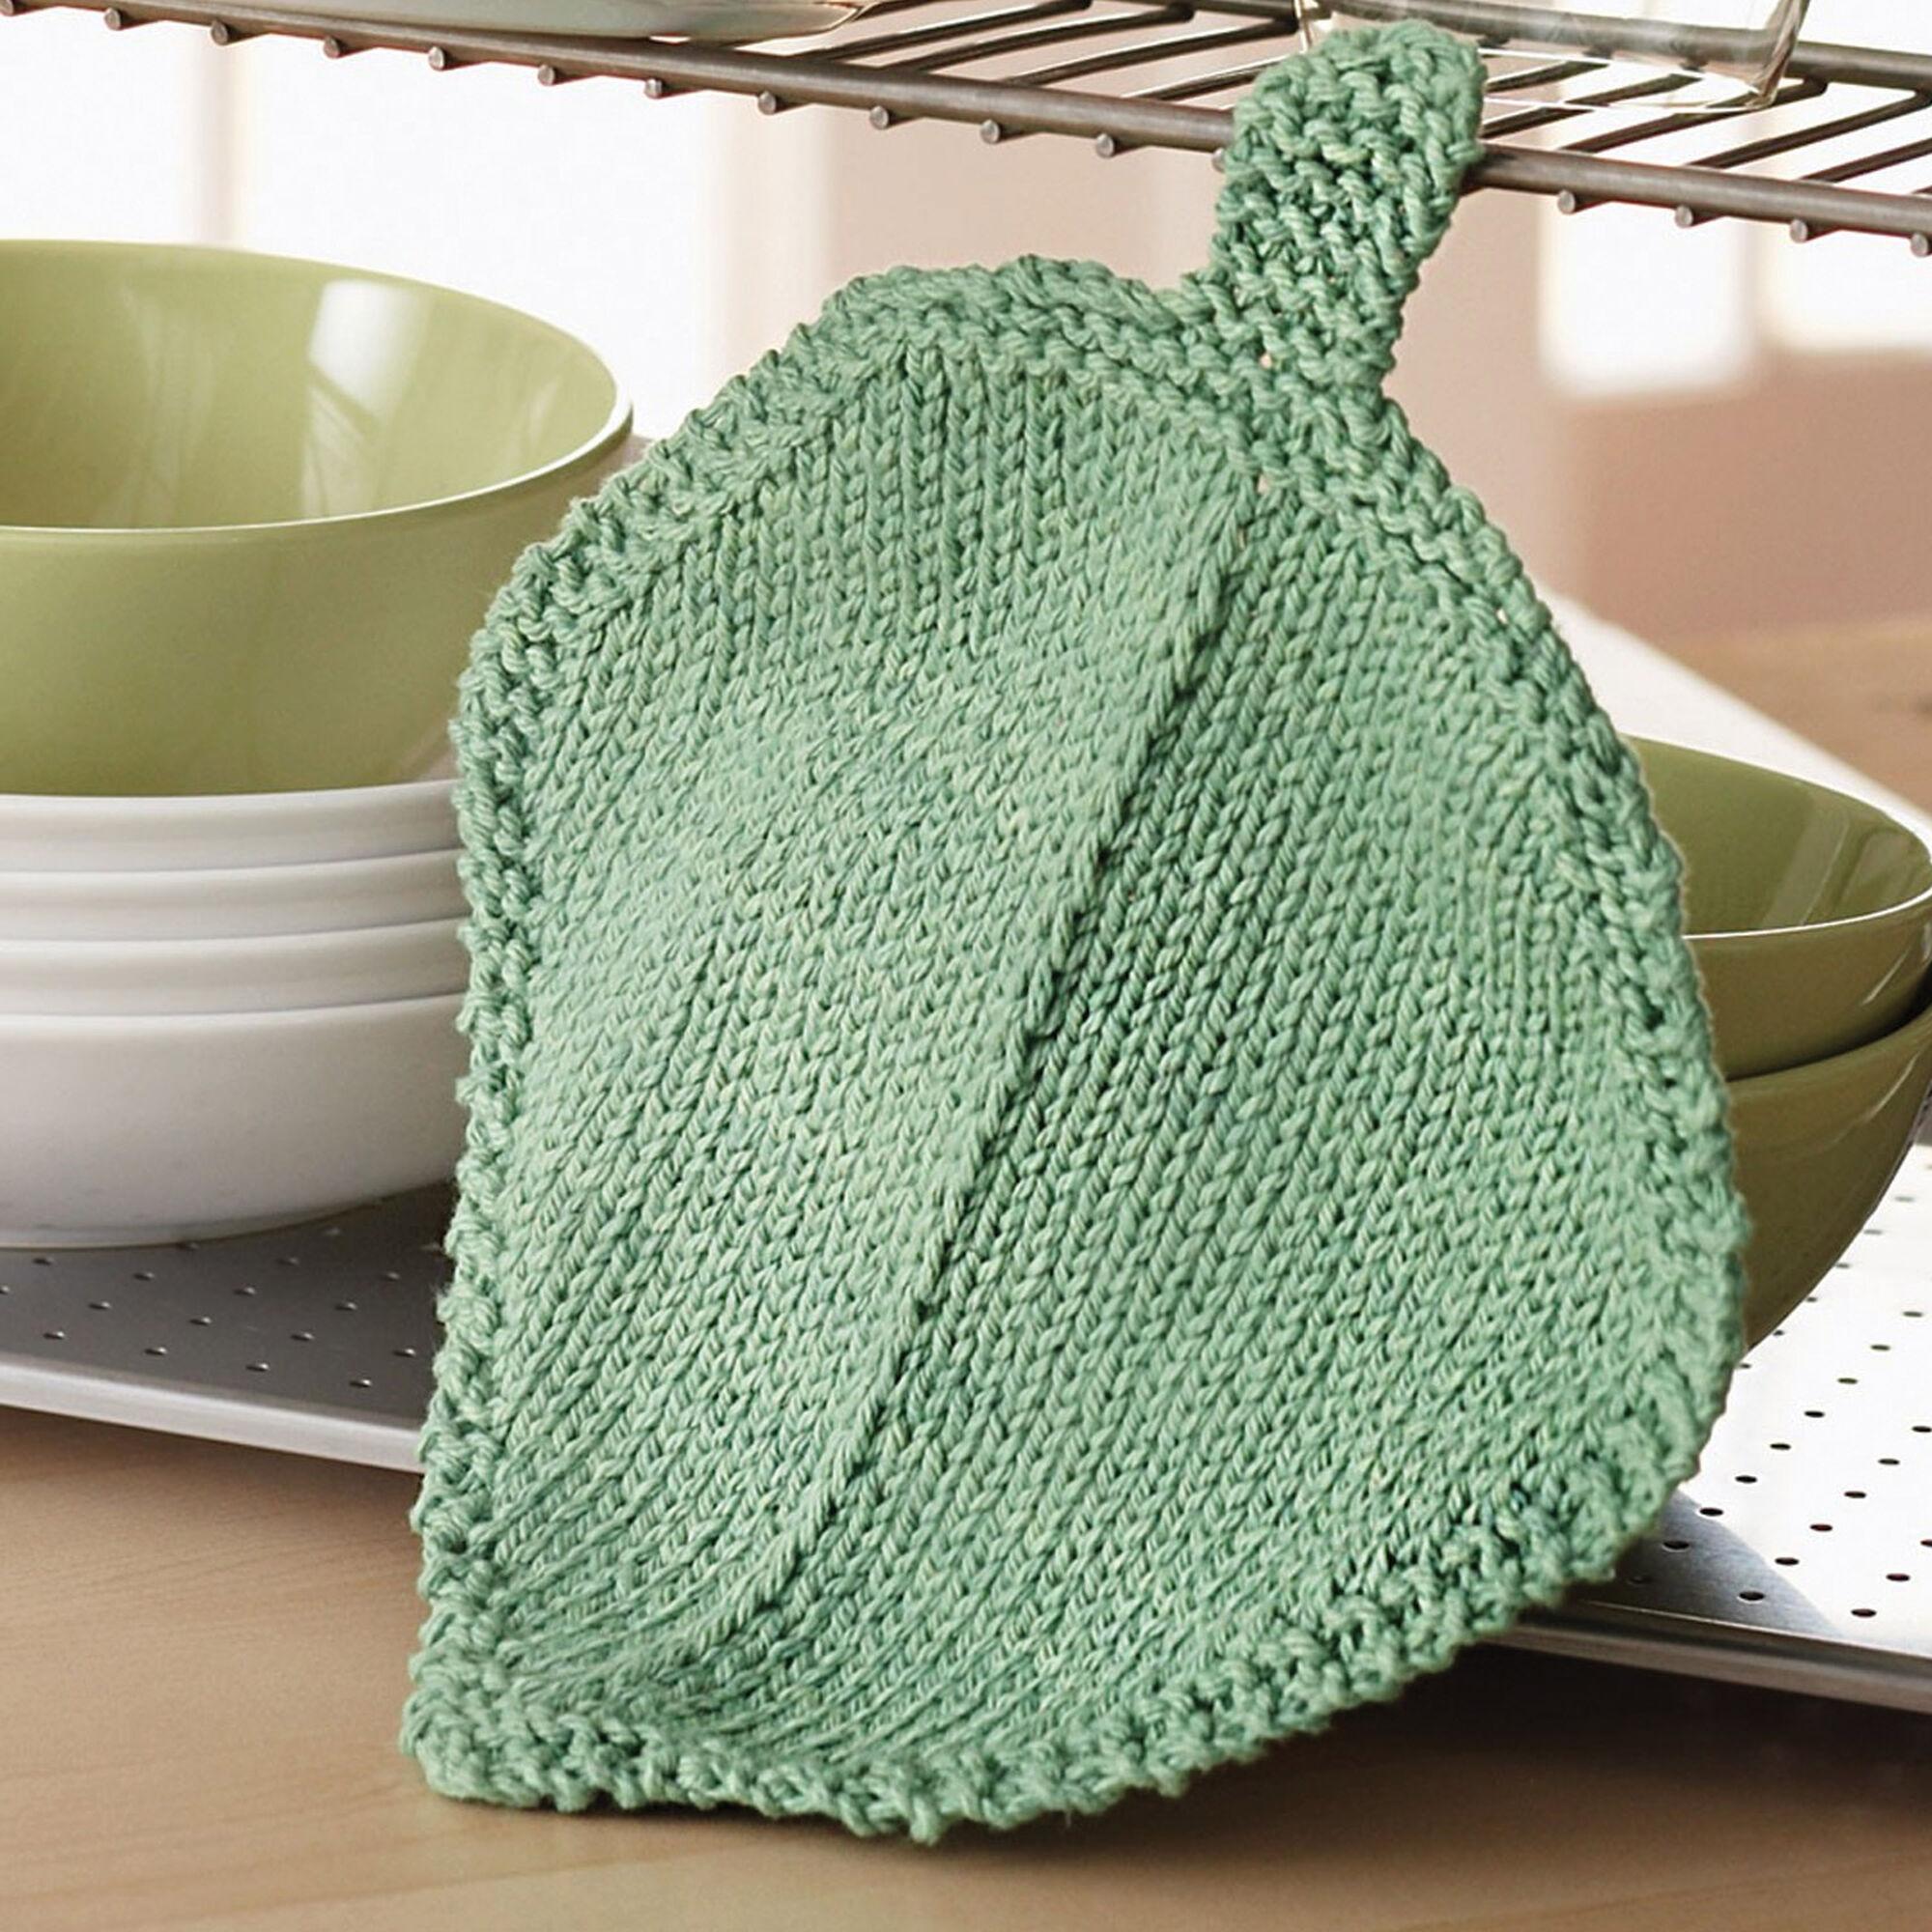 Bernat Garden Leaf Dishcloth   Yarnspirations